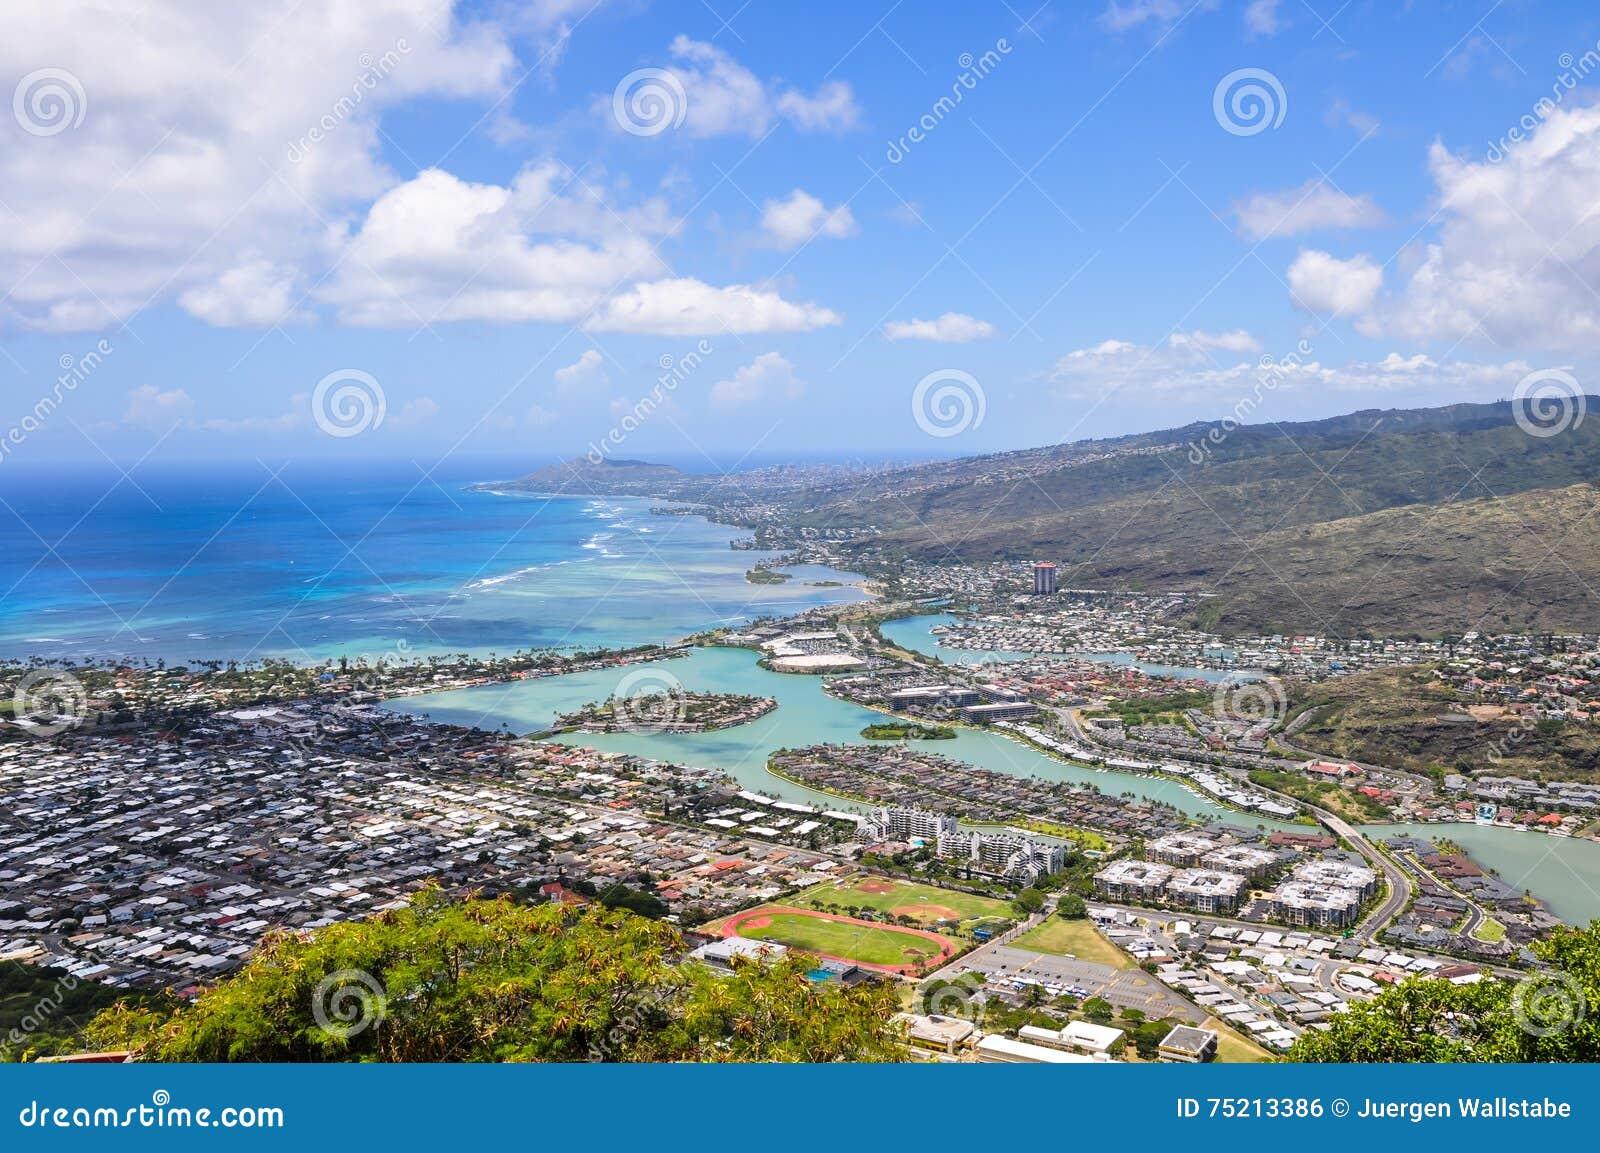 Contea Di Honolulu Hawaii le hawai kai visto da koko head - honolulu, oahu, hawai